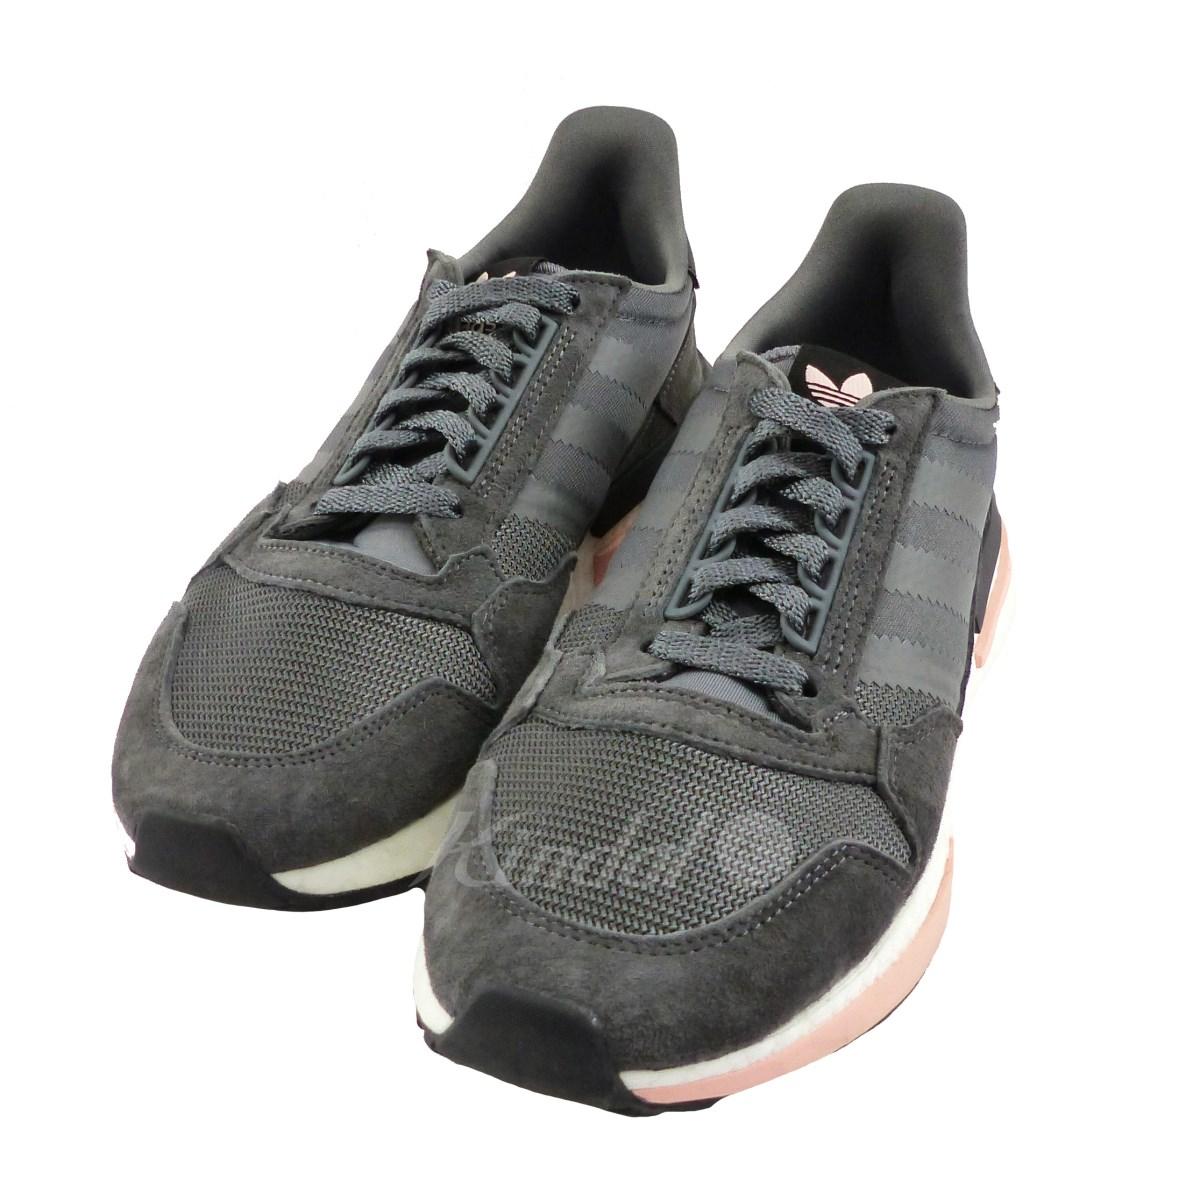 timeless design efb7d c313f adidas 2018AW ZX 500 RM gray X pink size: 26. 5cm (Adidas)